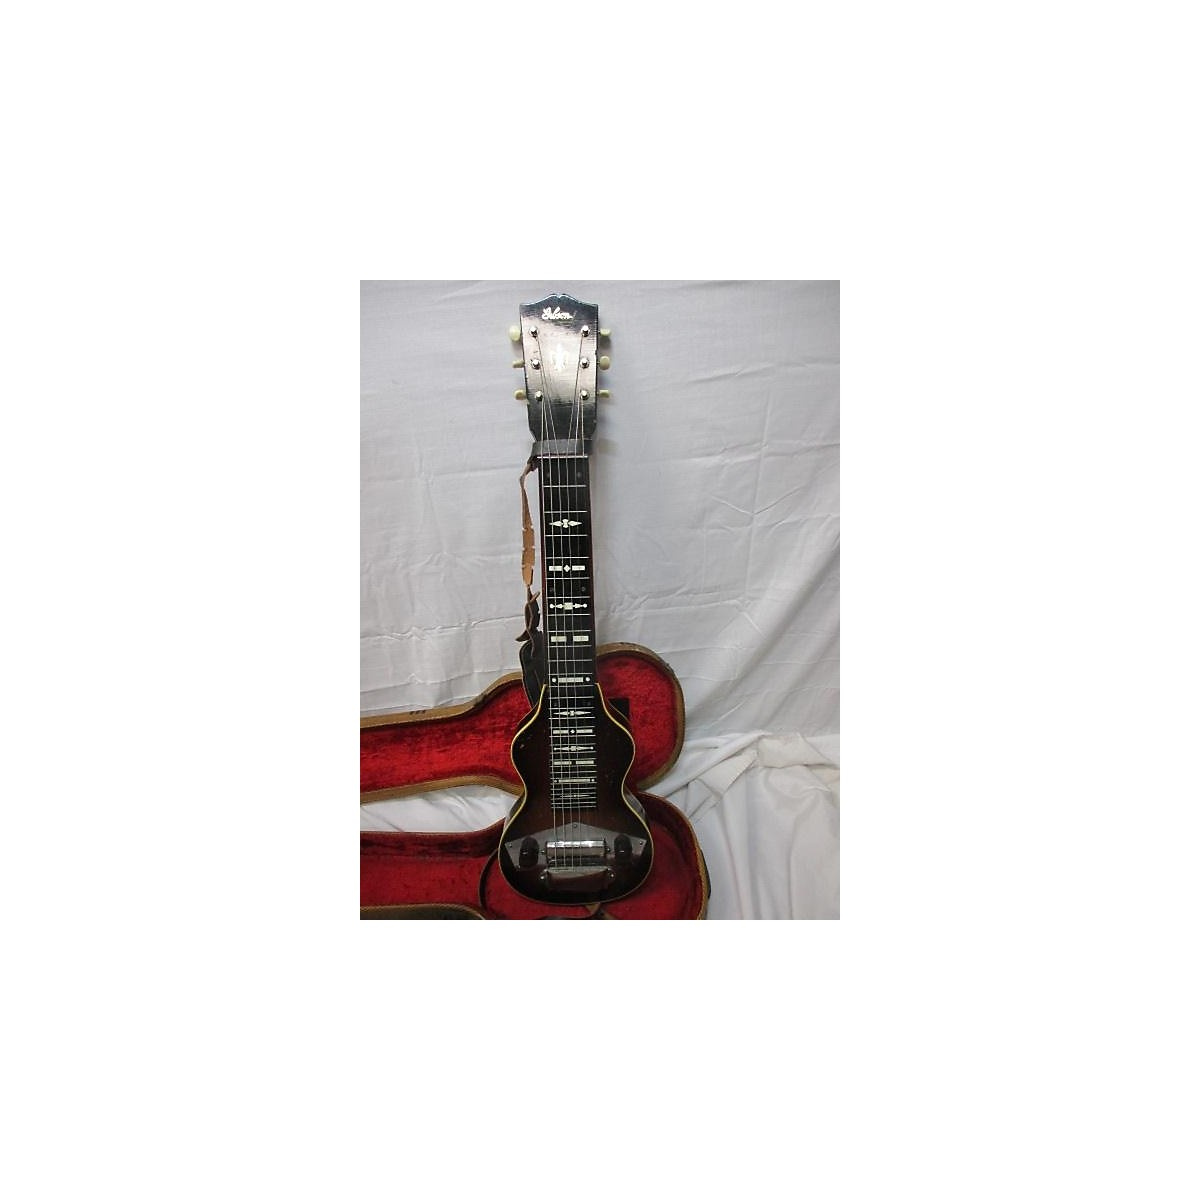 Gibson 1940s Lapsteel Lap Steel